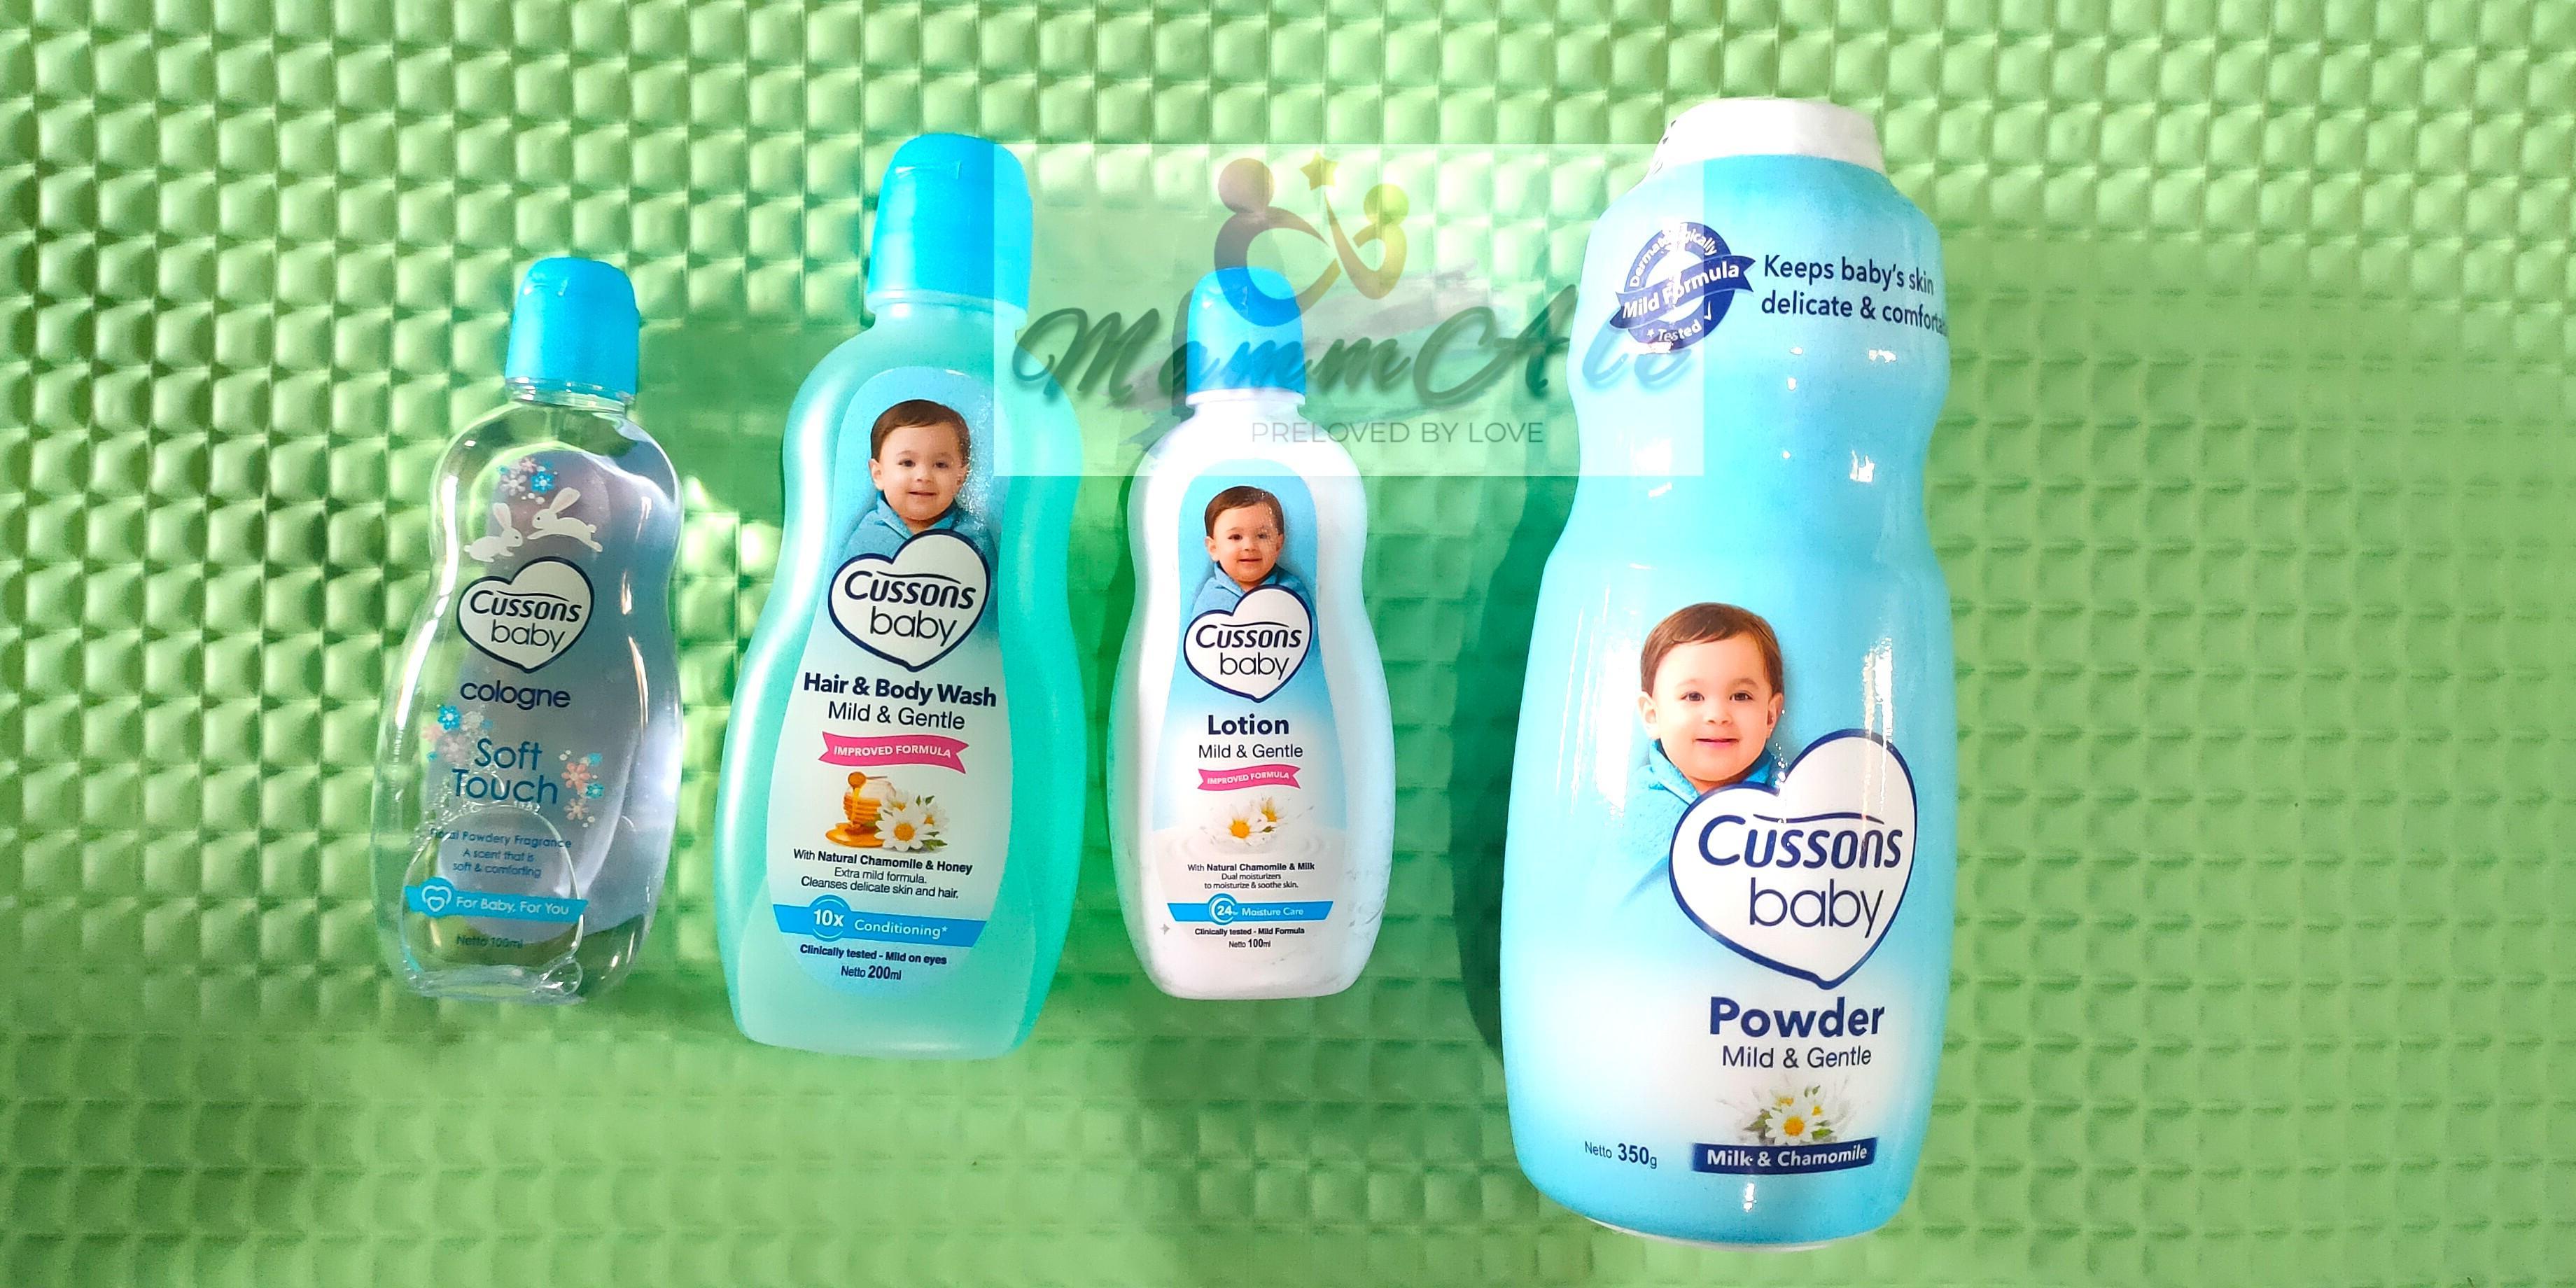 Cussons Baby Powder Lotion Hair And Body Wash Cologne Bonus Cd Lagu Bayi Kesehatan Kecantikan Kulit Sabun Tubuh Di Carousell